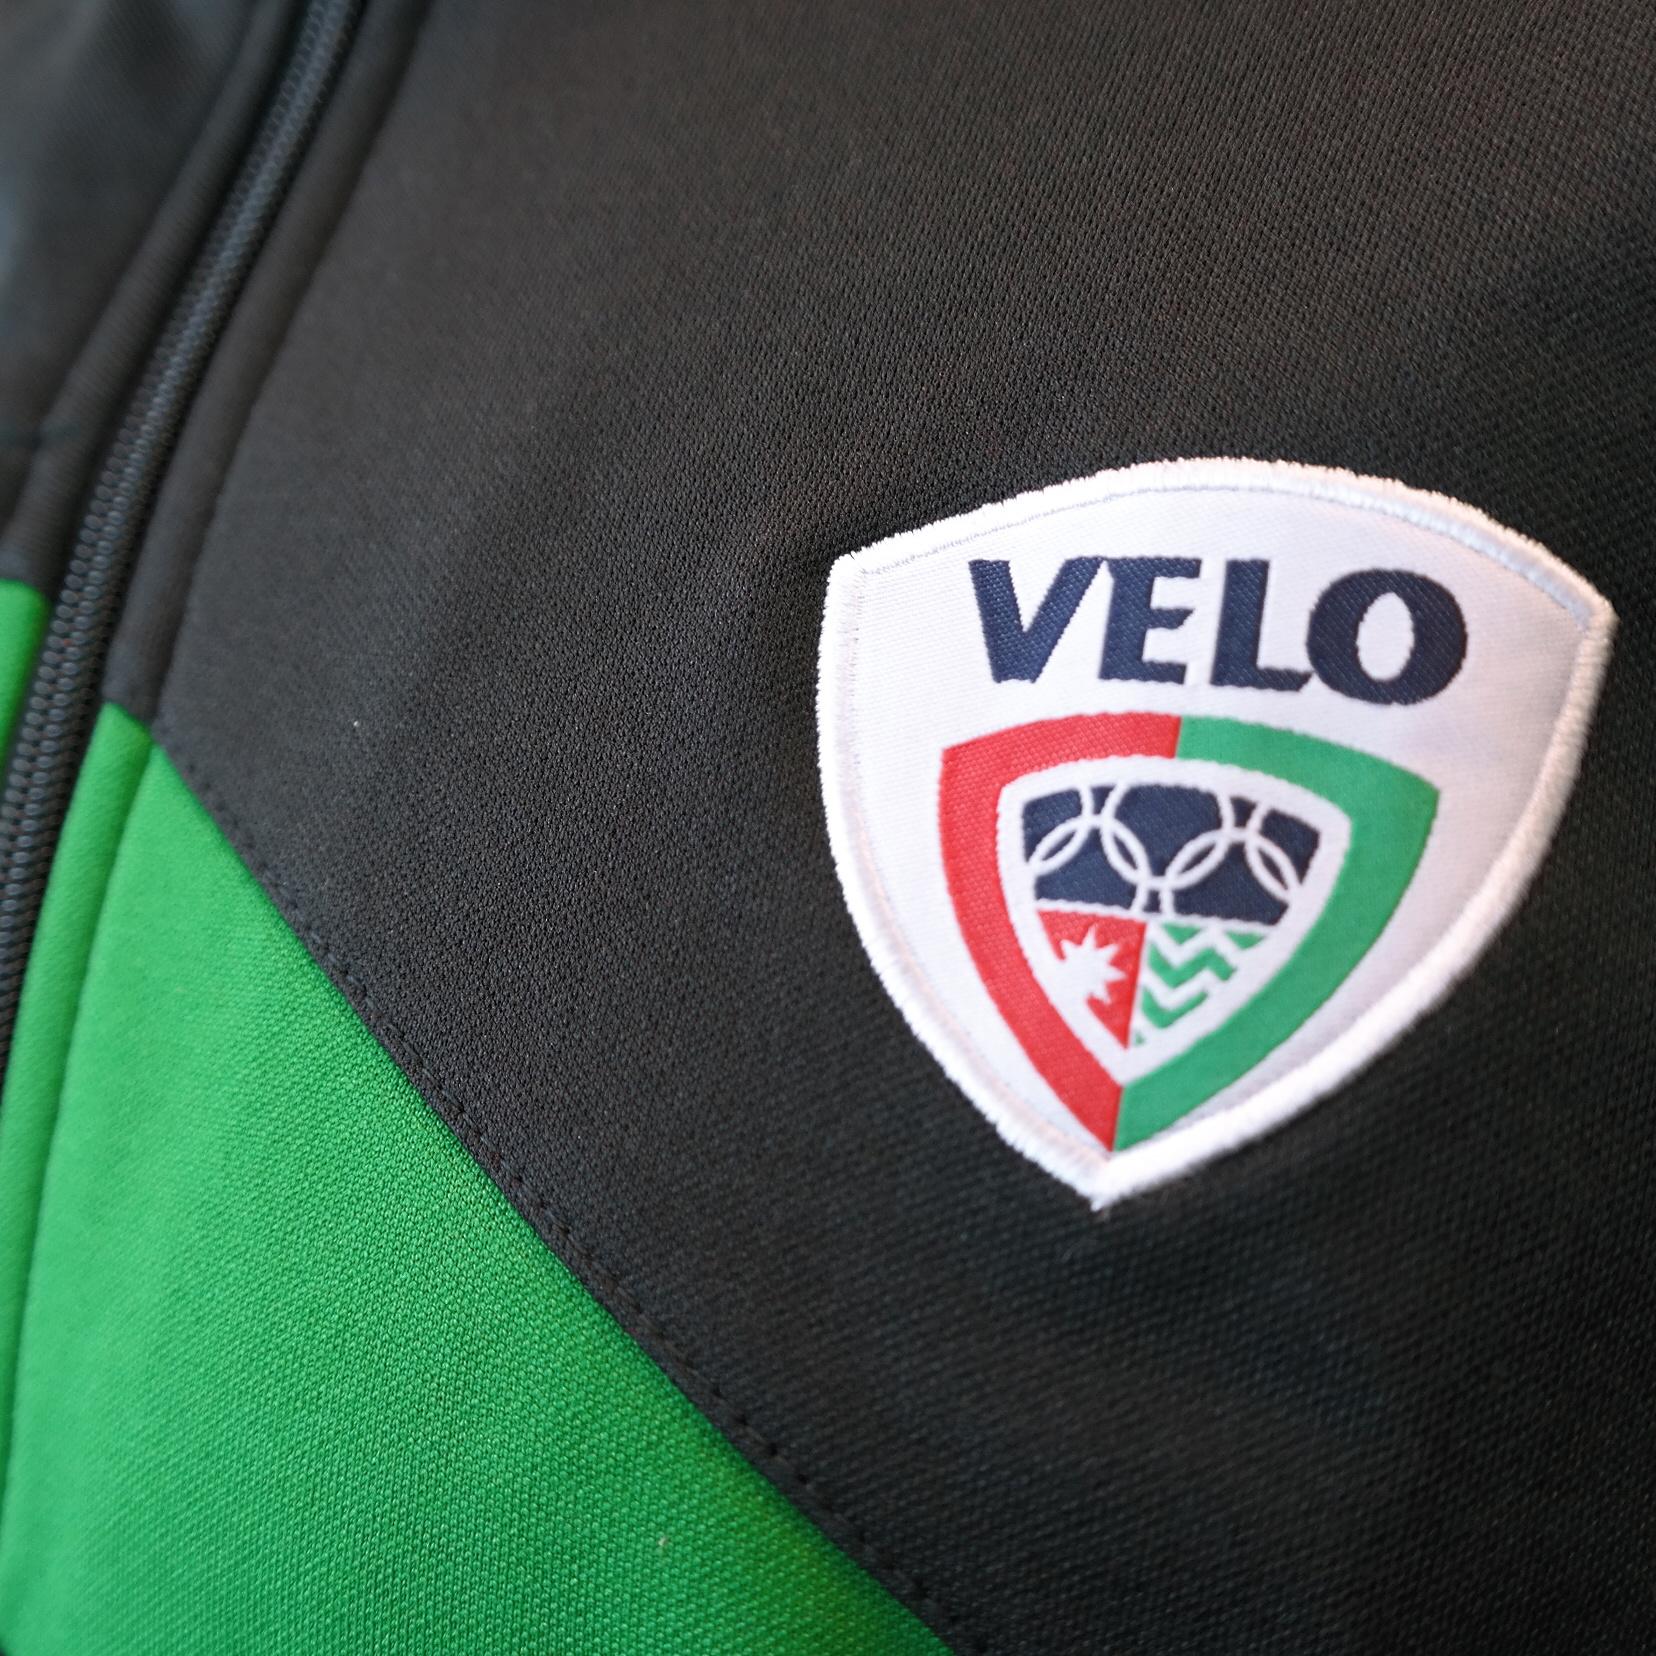 Velo Jack Jeugd, Zwart/Groen